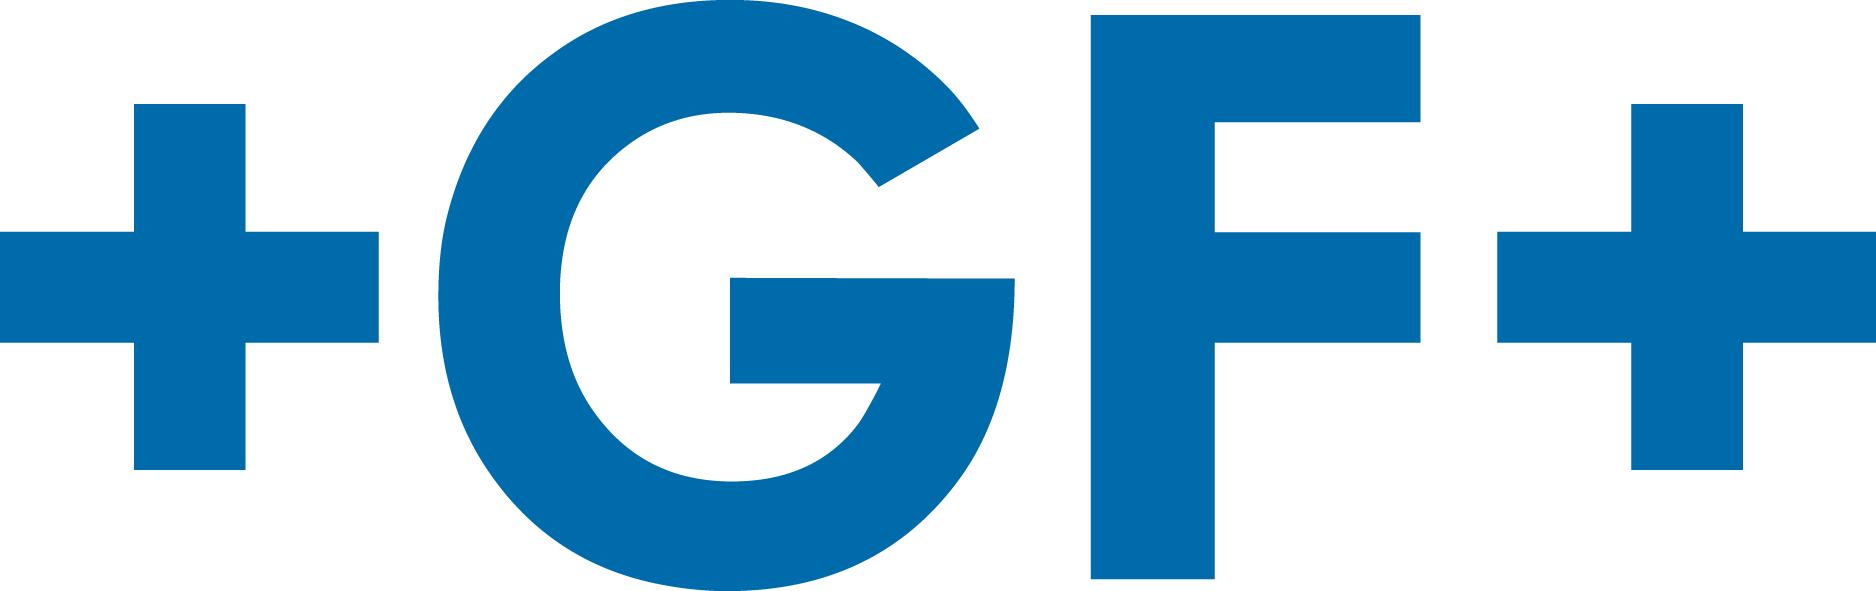 GF Machining Solutions GmbH